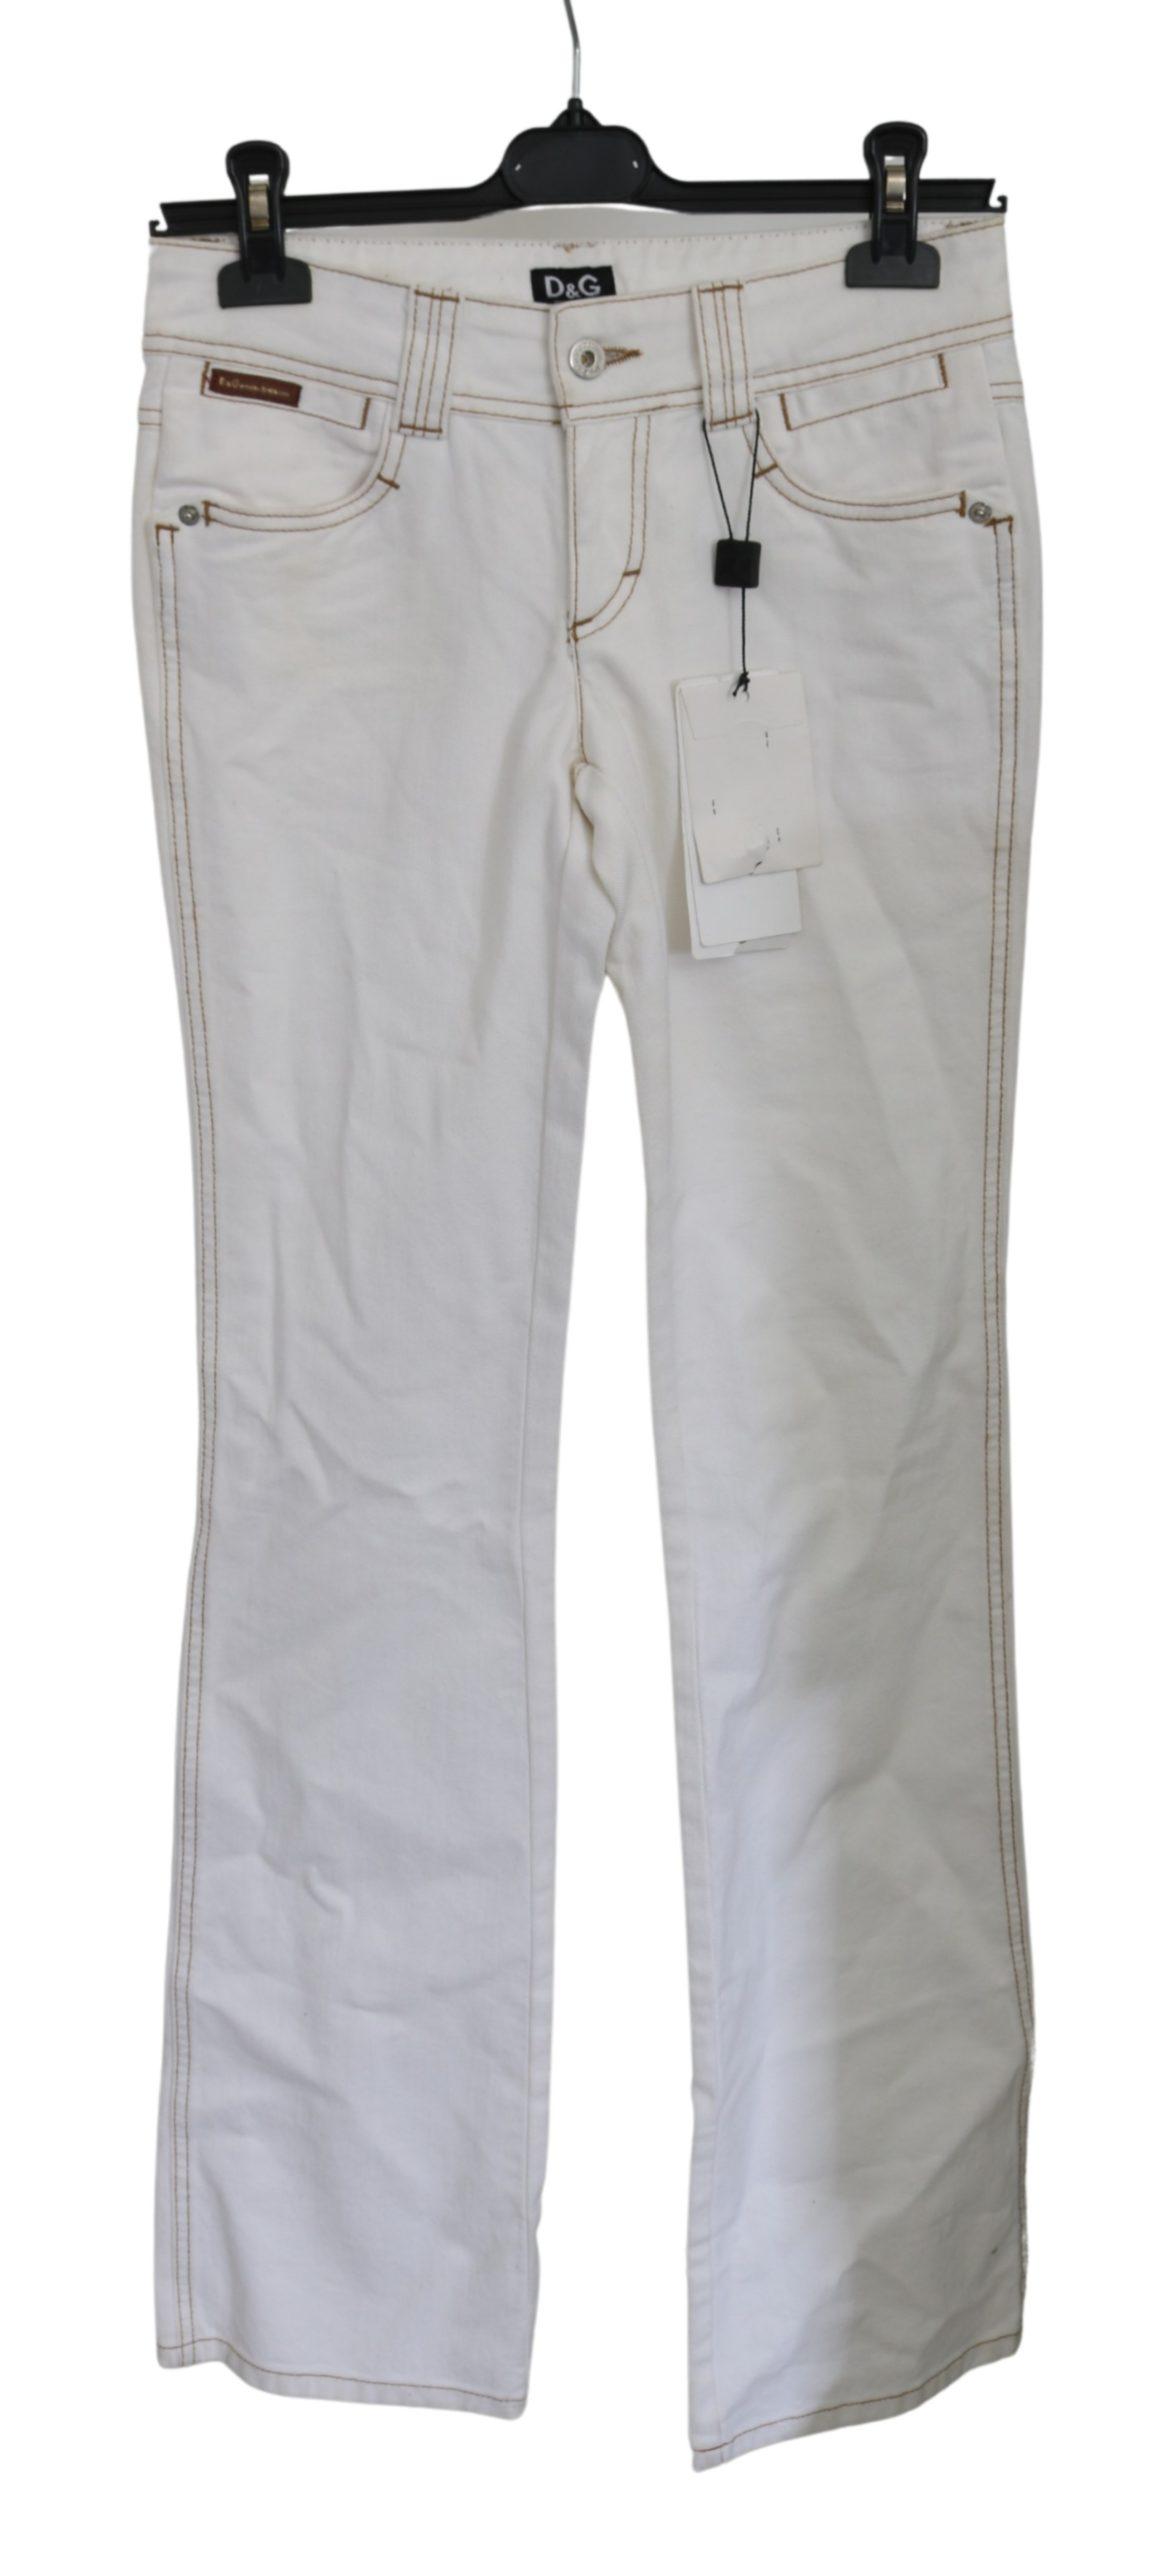 Dolce & Gabbana Women's Low Waist Cotton Jeans BYX1342 - W24